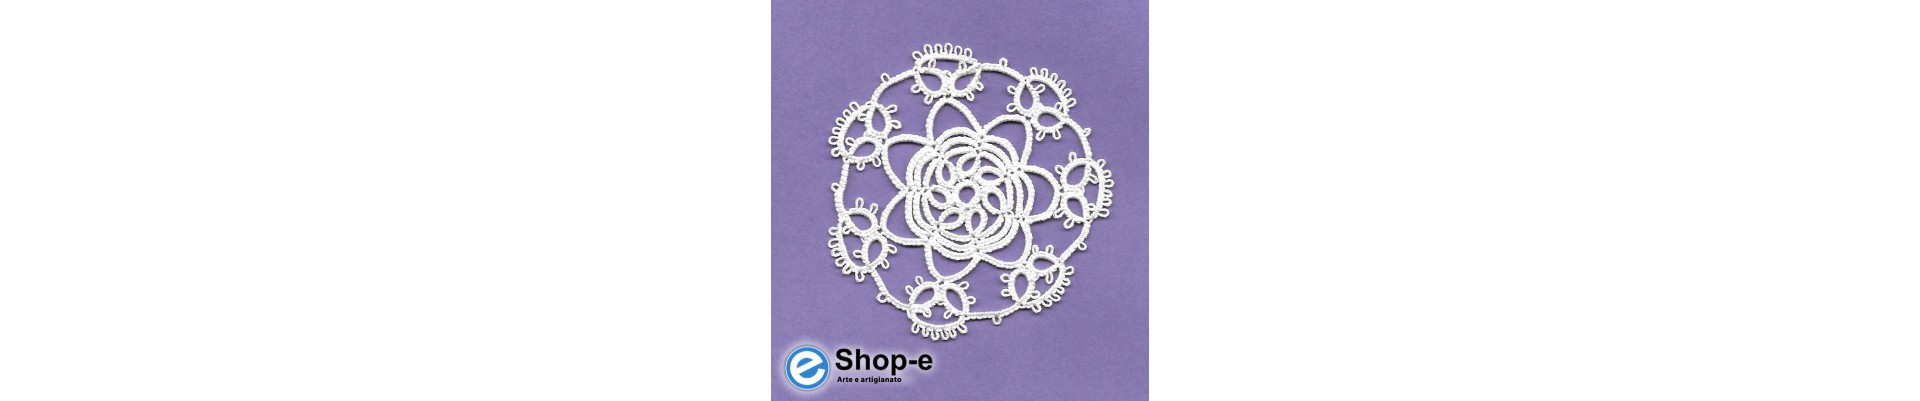 Borders, Laces and Lace for sale online at Shop-e sicilymart.com